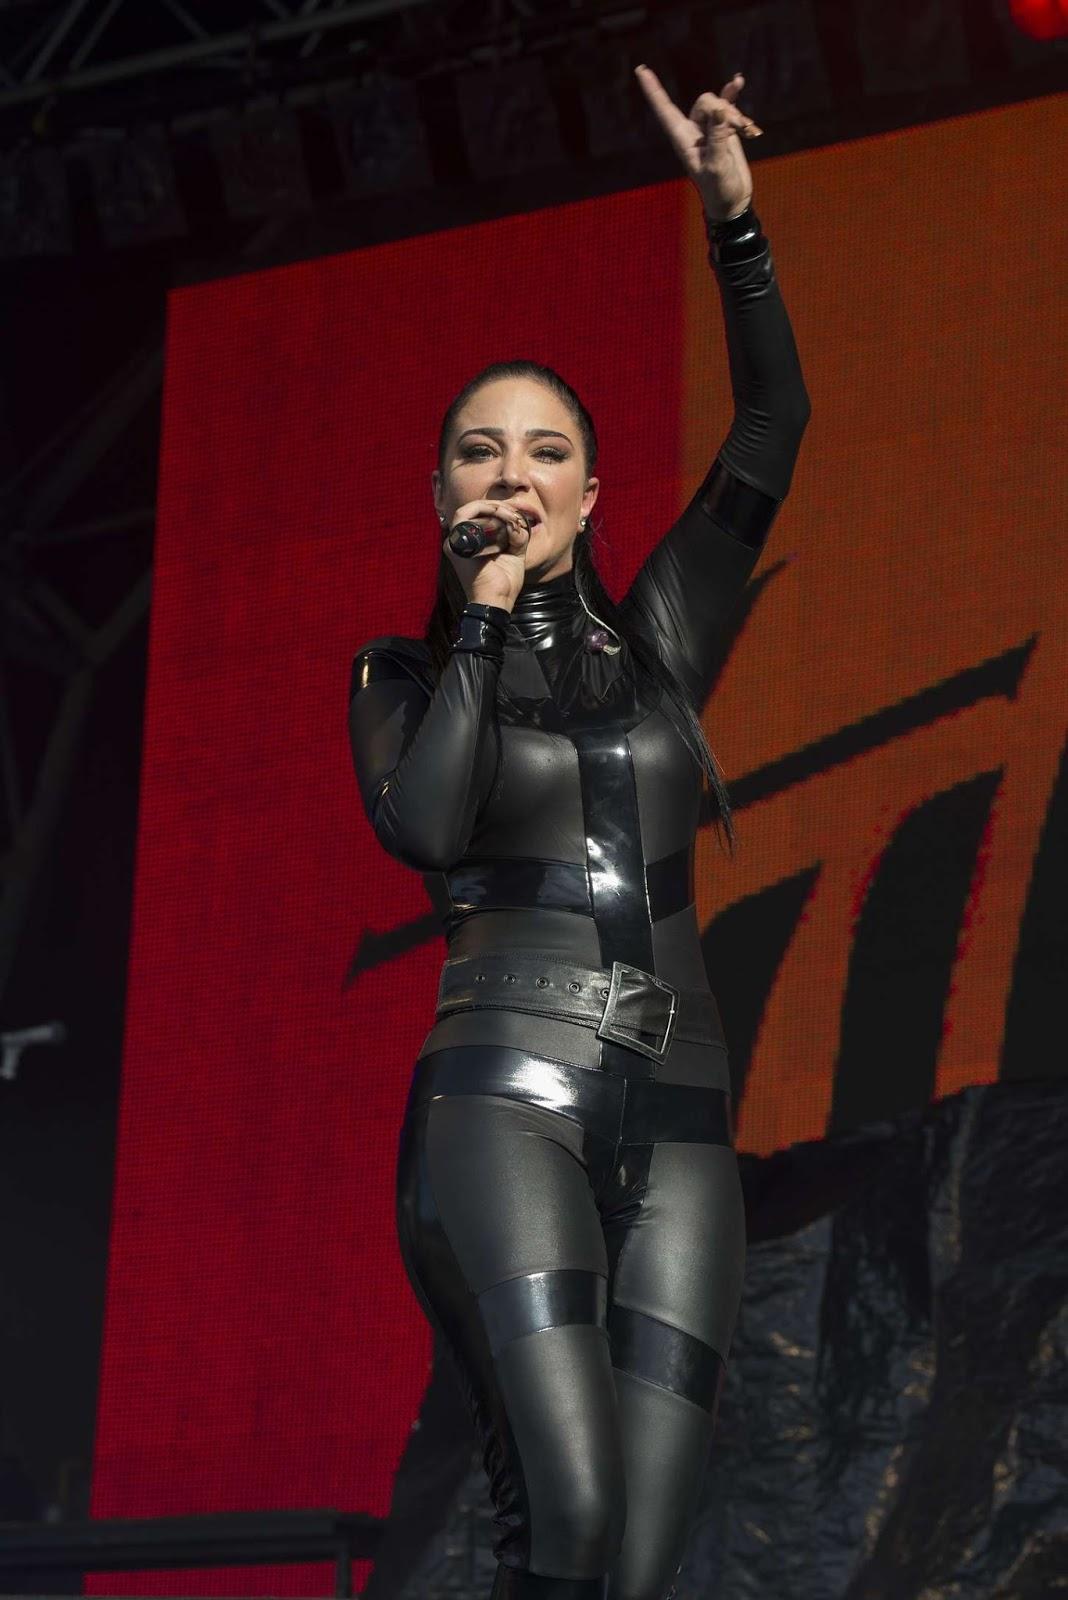 Tulisa Contostavlos – Performs on stage during Brighton Pride 2015 ... Karen Gillan Photoshoot 2014